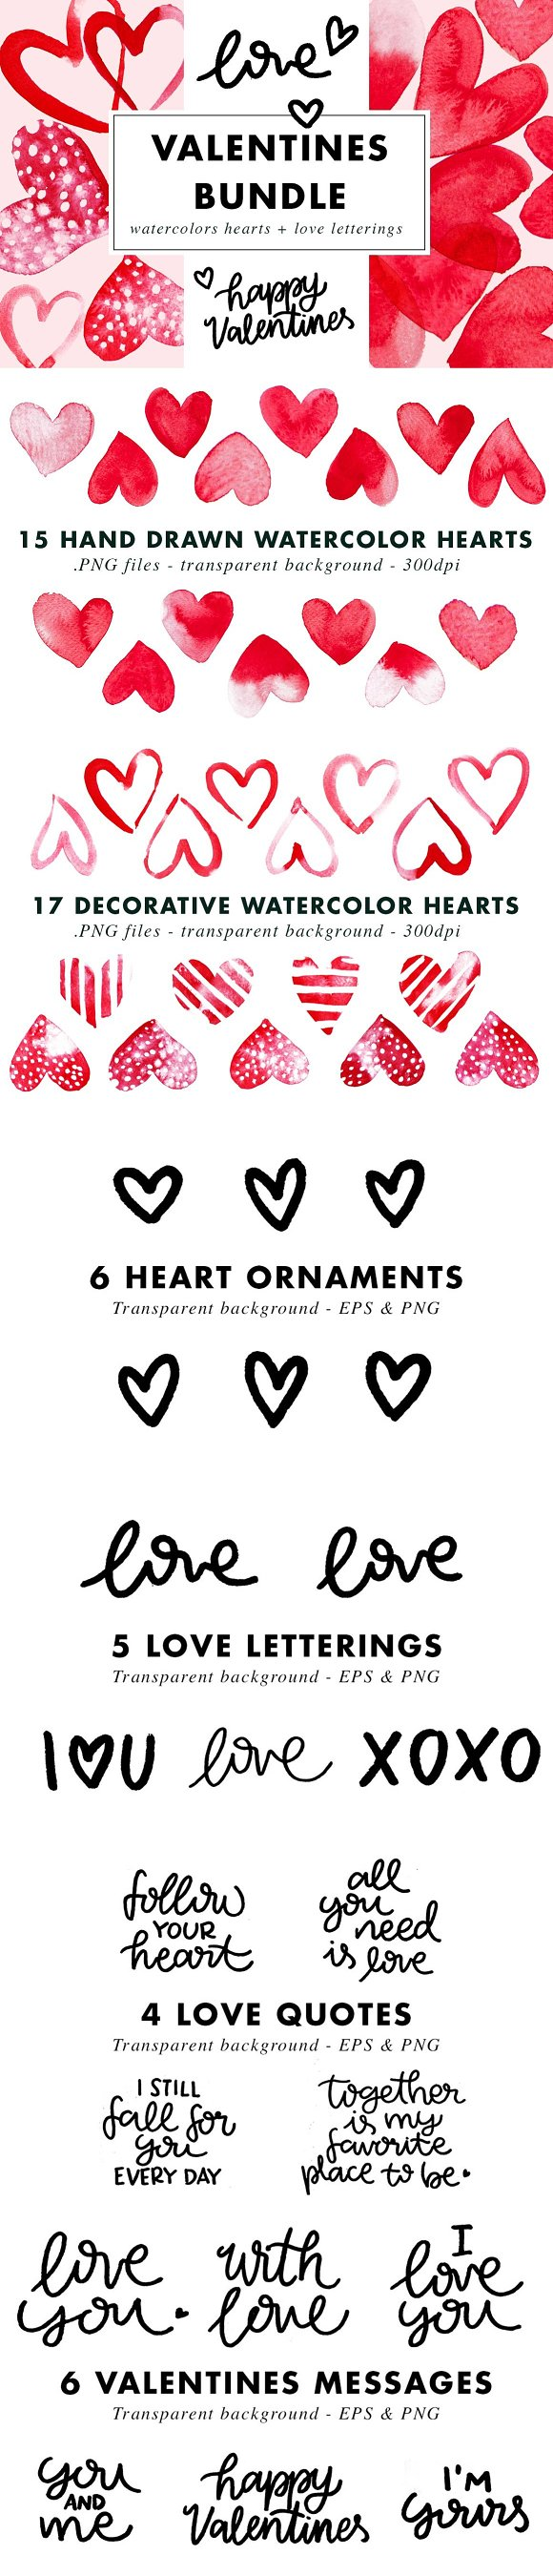 Valentines Bundle Hearts & Lettering